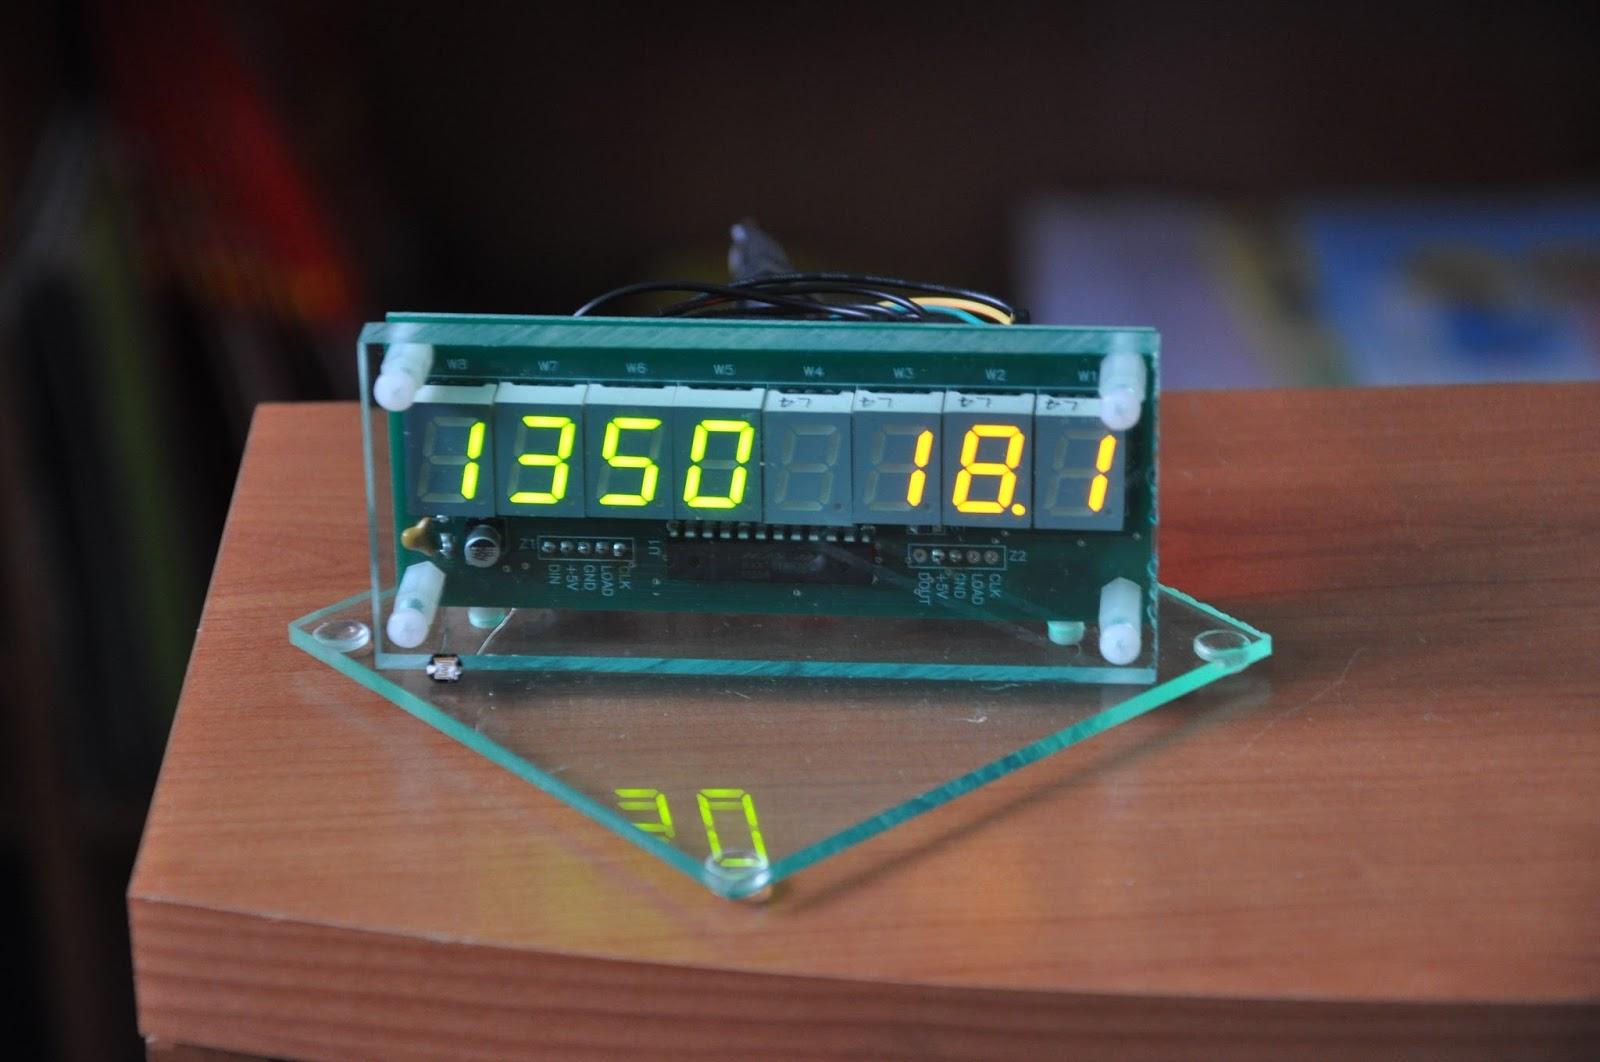 Mikrokontrolery PIC: MCP79410 - zegarek od Microchipa